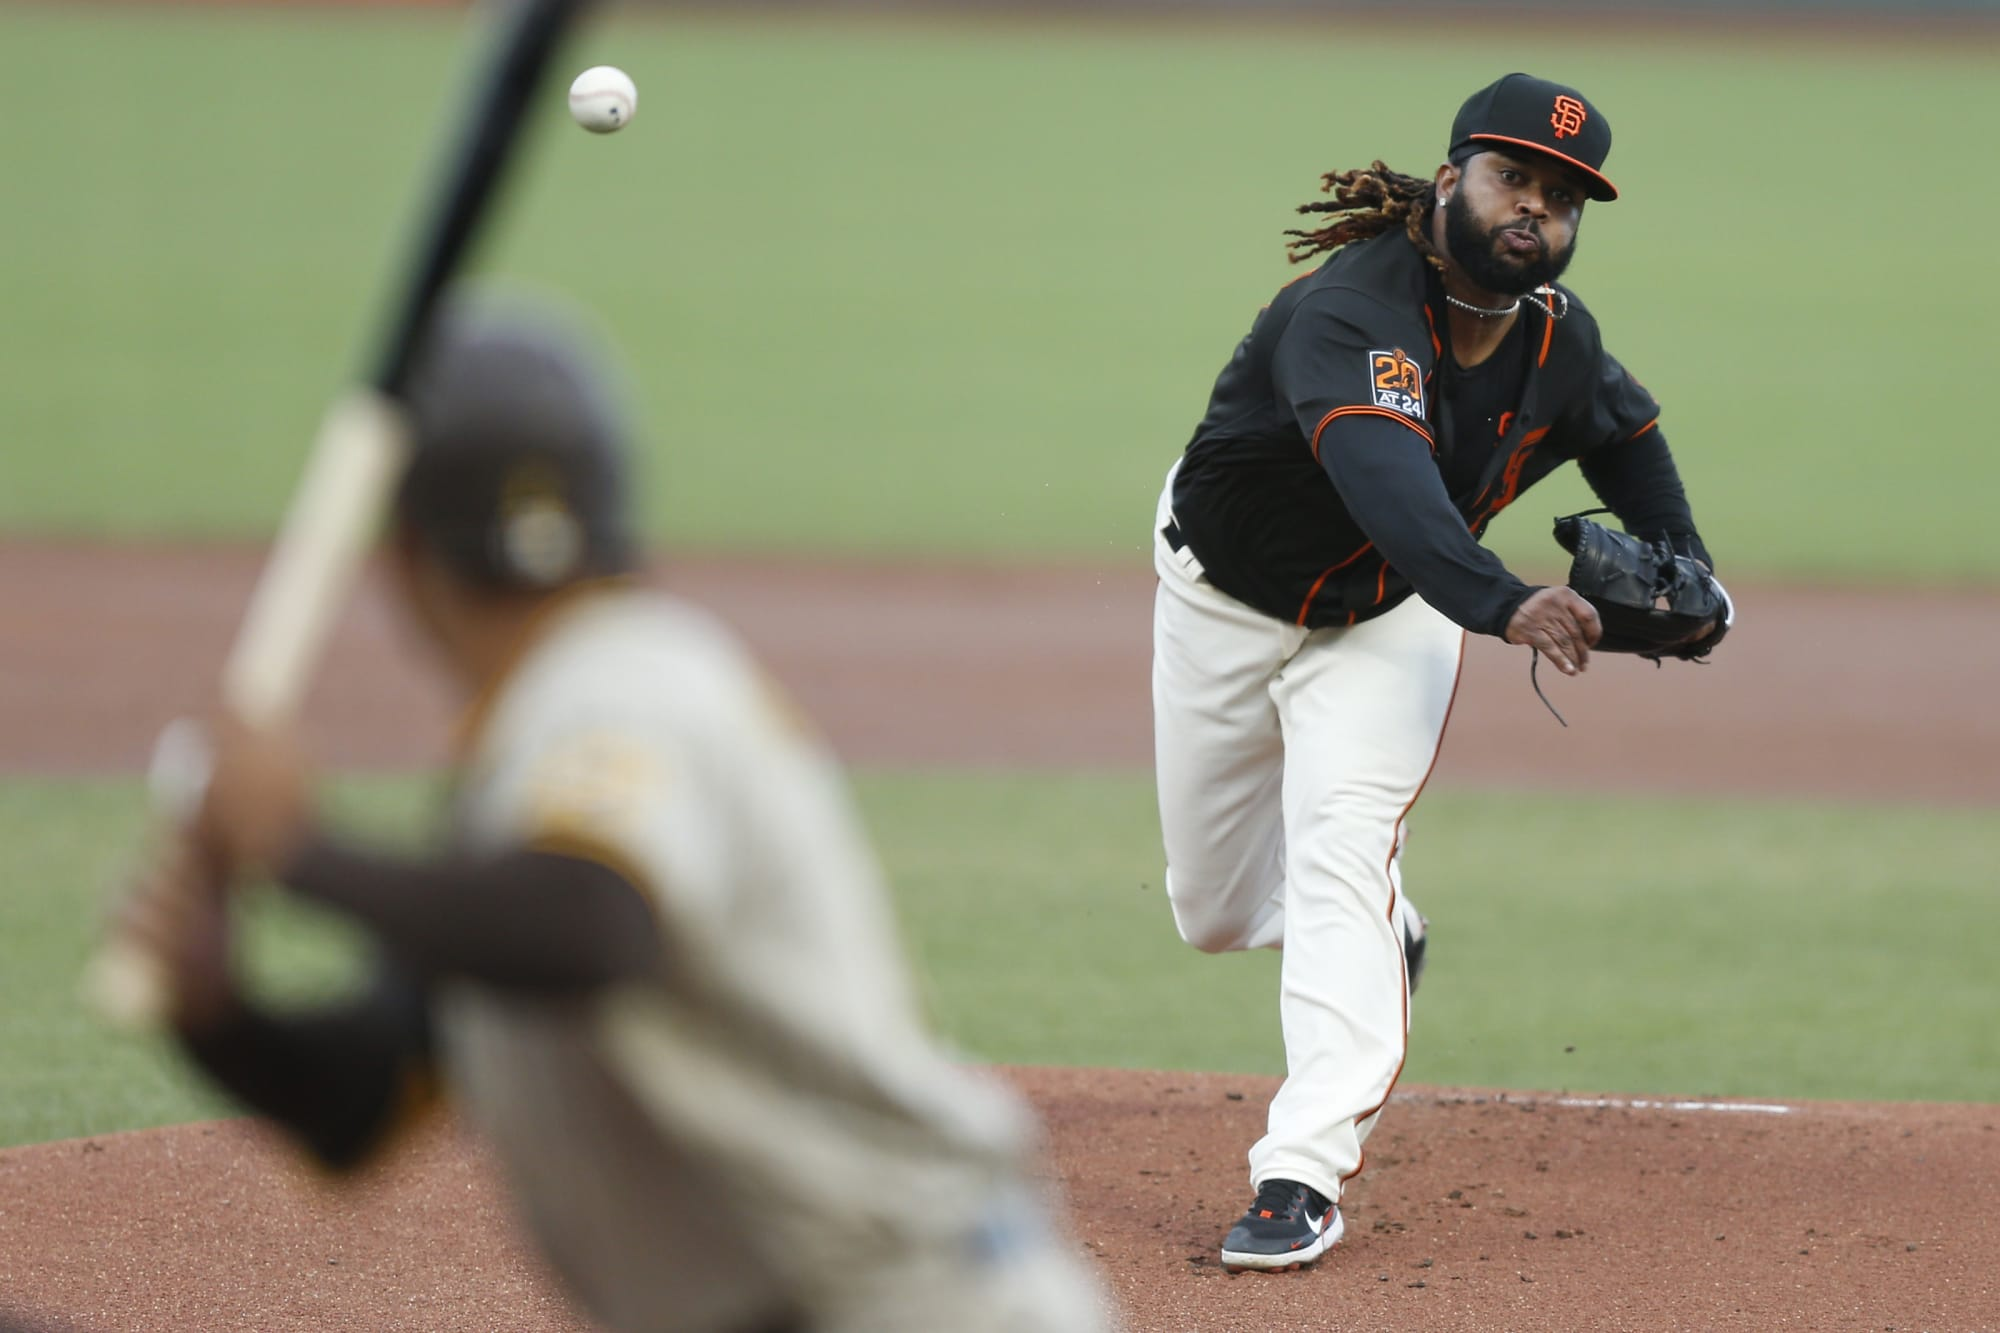 SF Giants: Cueto, Longoria, and Davis Scheduled to Debut Tomorrow